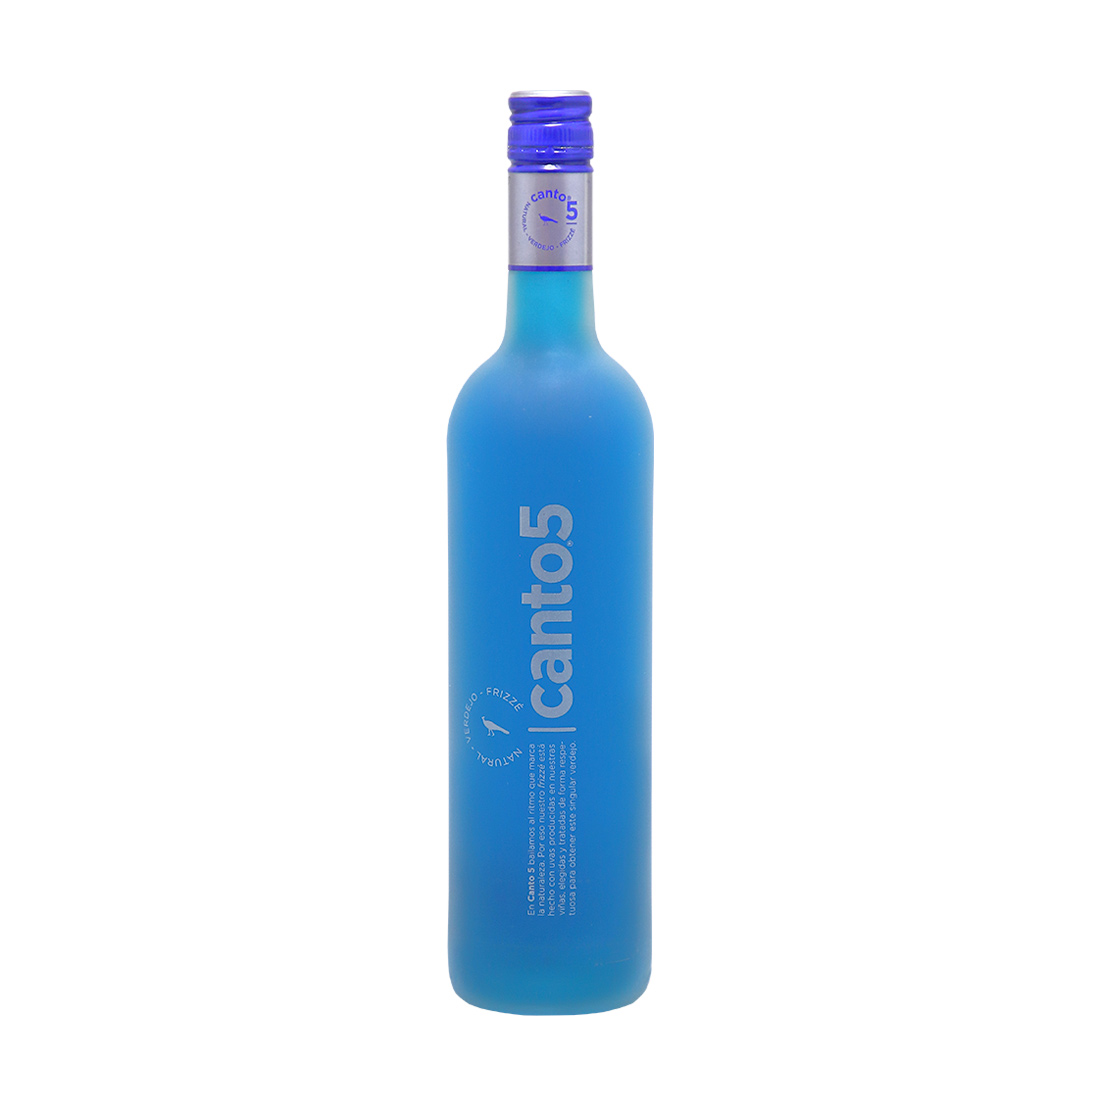 Canto 5 Frizze Verdejo - Diez Siglos de Verdejo Azul - Vino Blanco